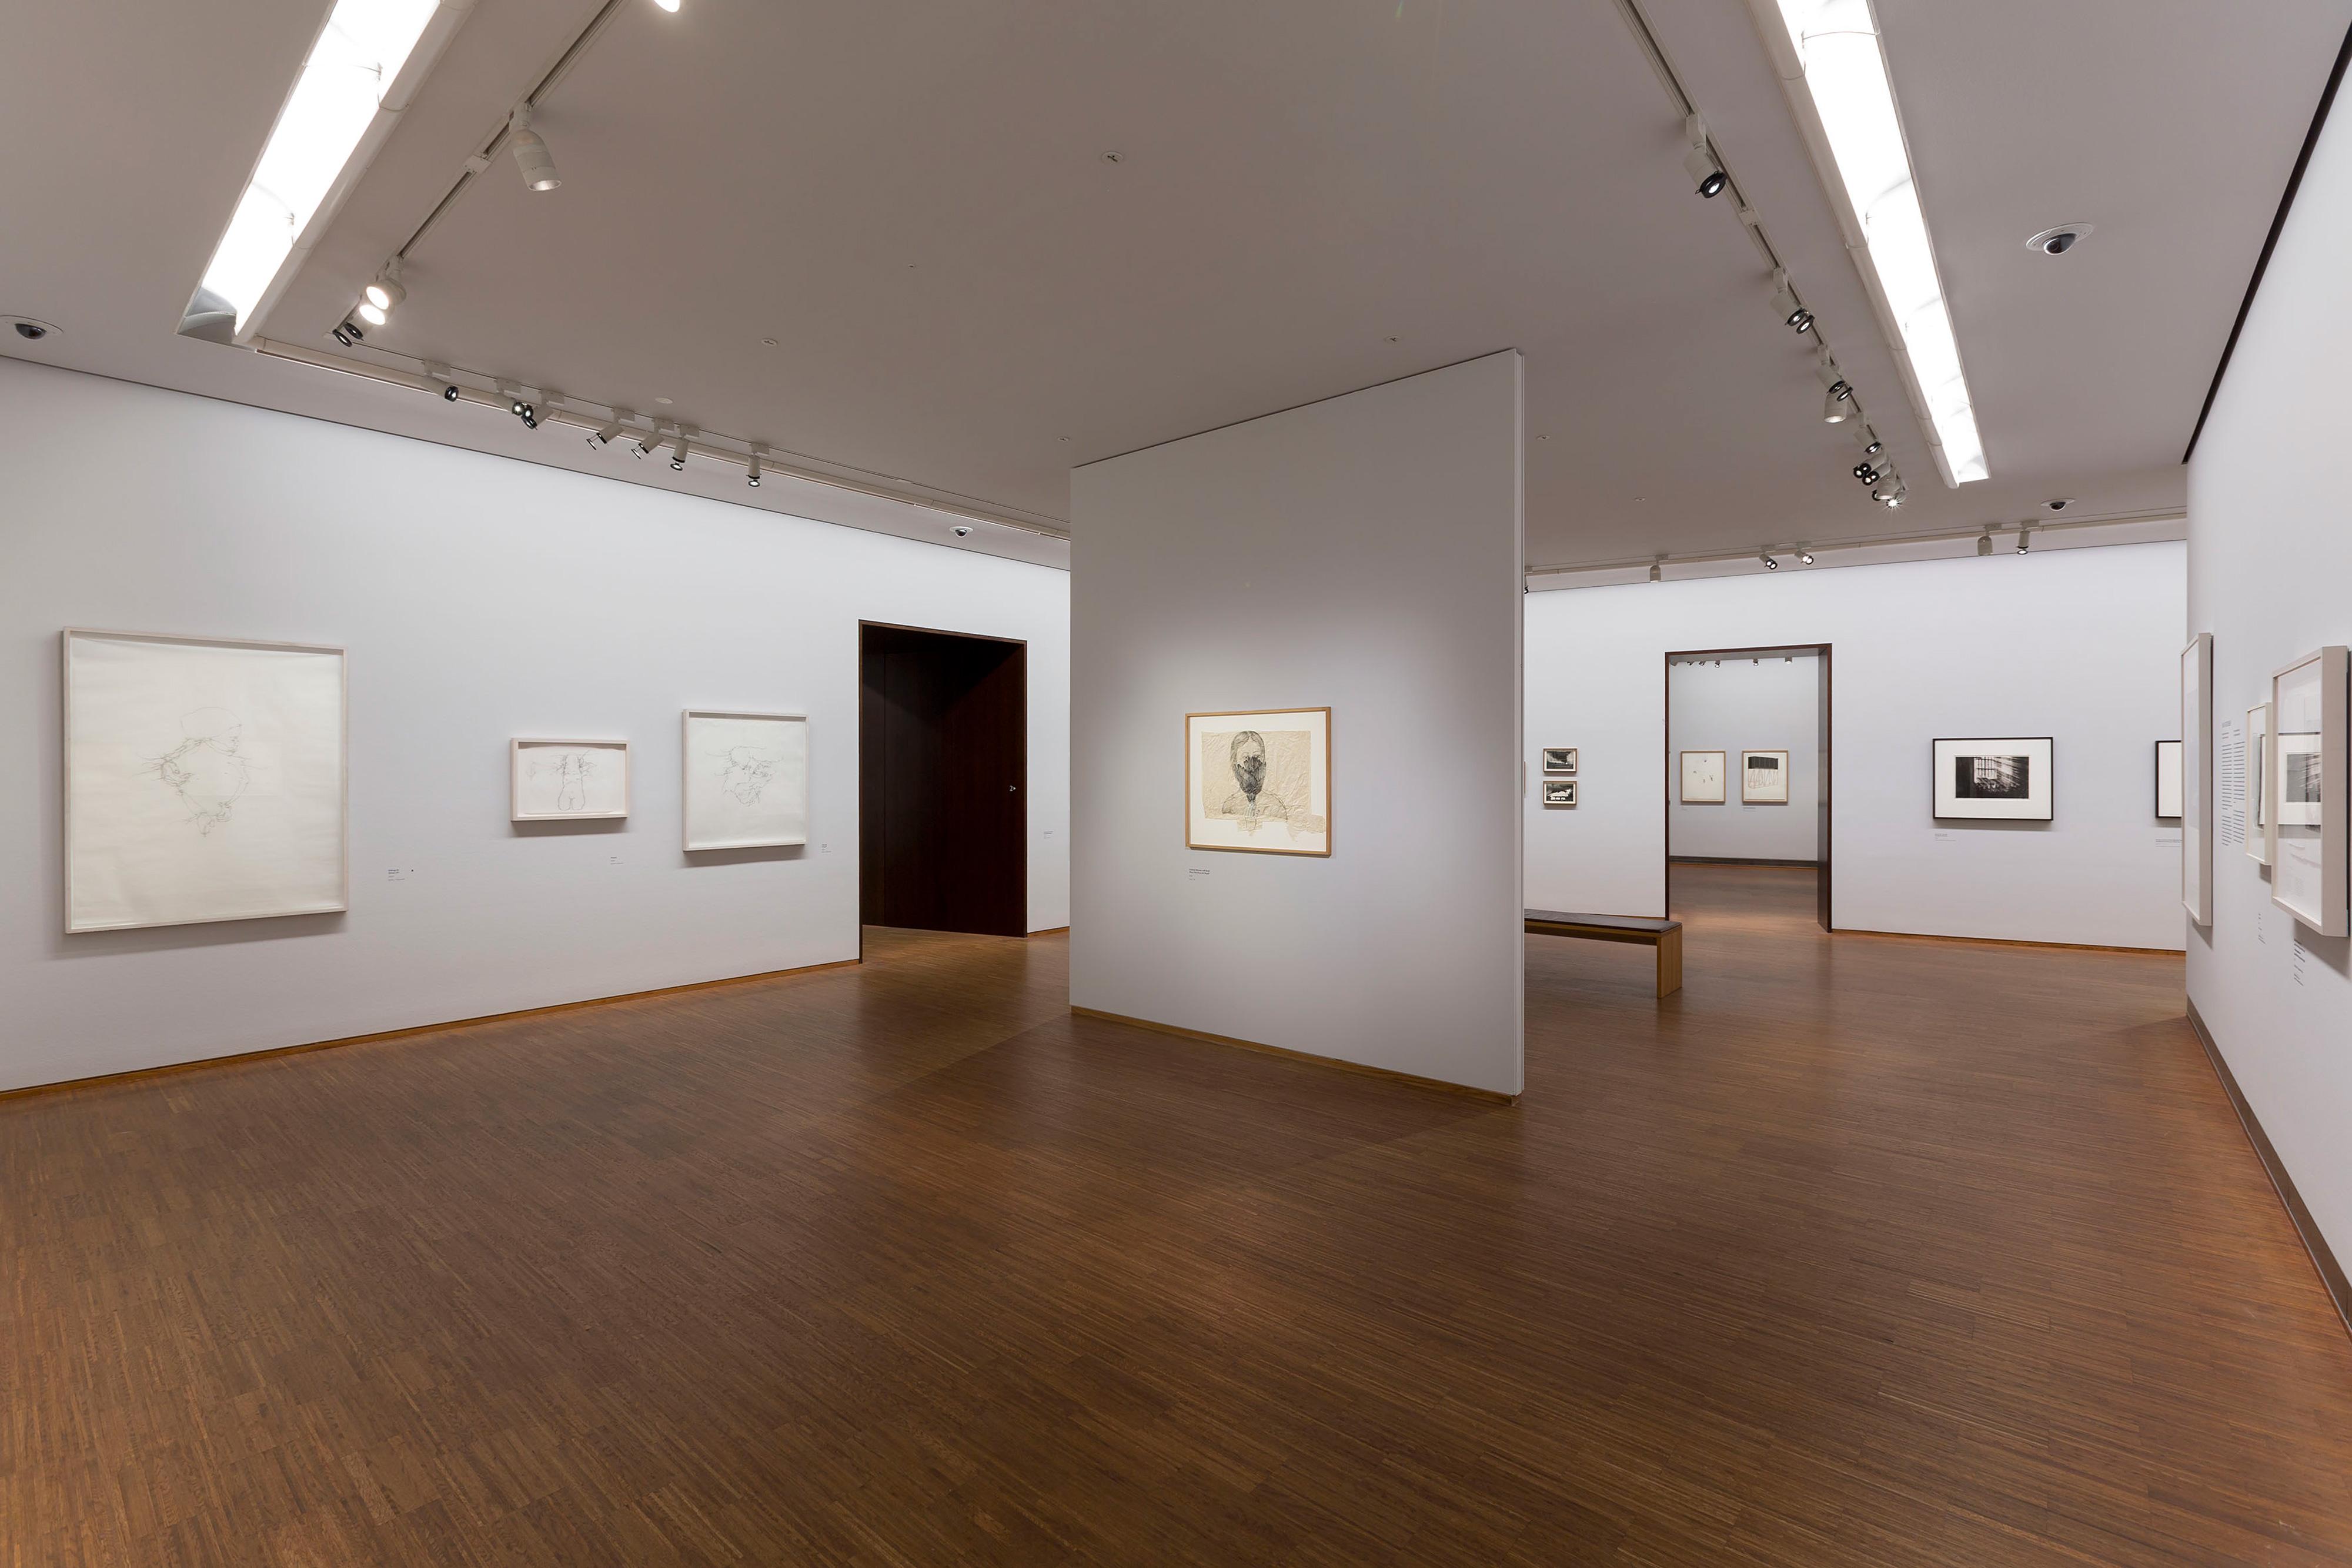 Galerie Barbara Thumm \ Chloe Piene – A Passion for Drawing. Die Sammlung Guerlain aus dem Centre Pompidou in Paris